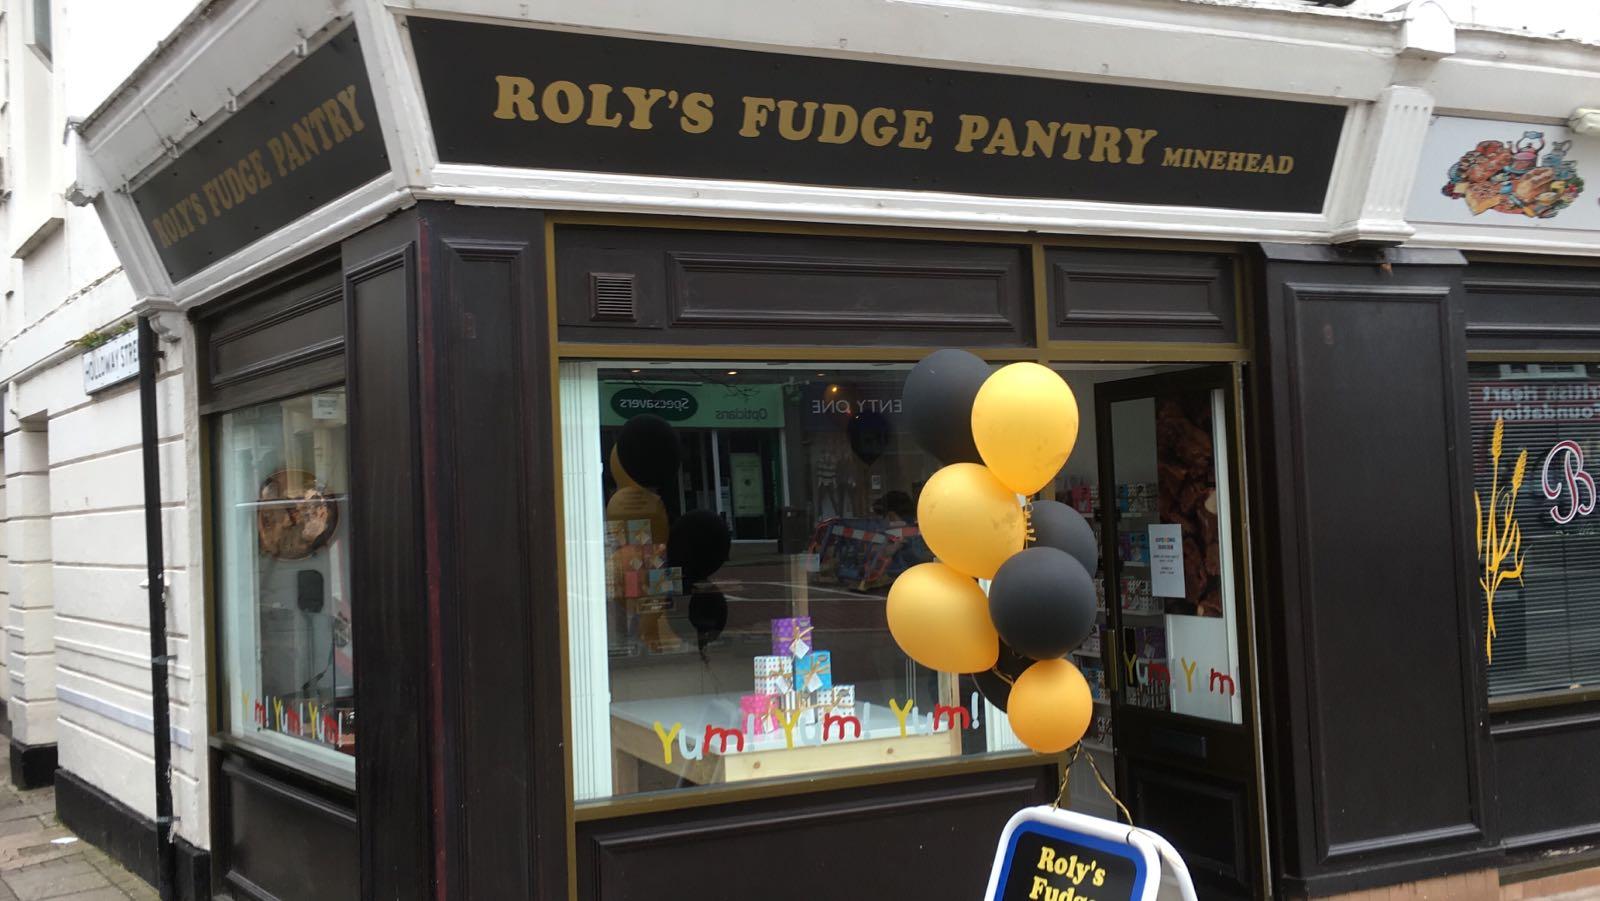 Roly's Fudge Minehead